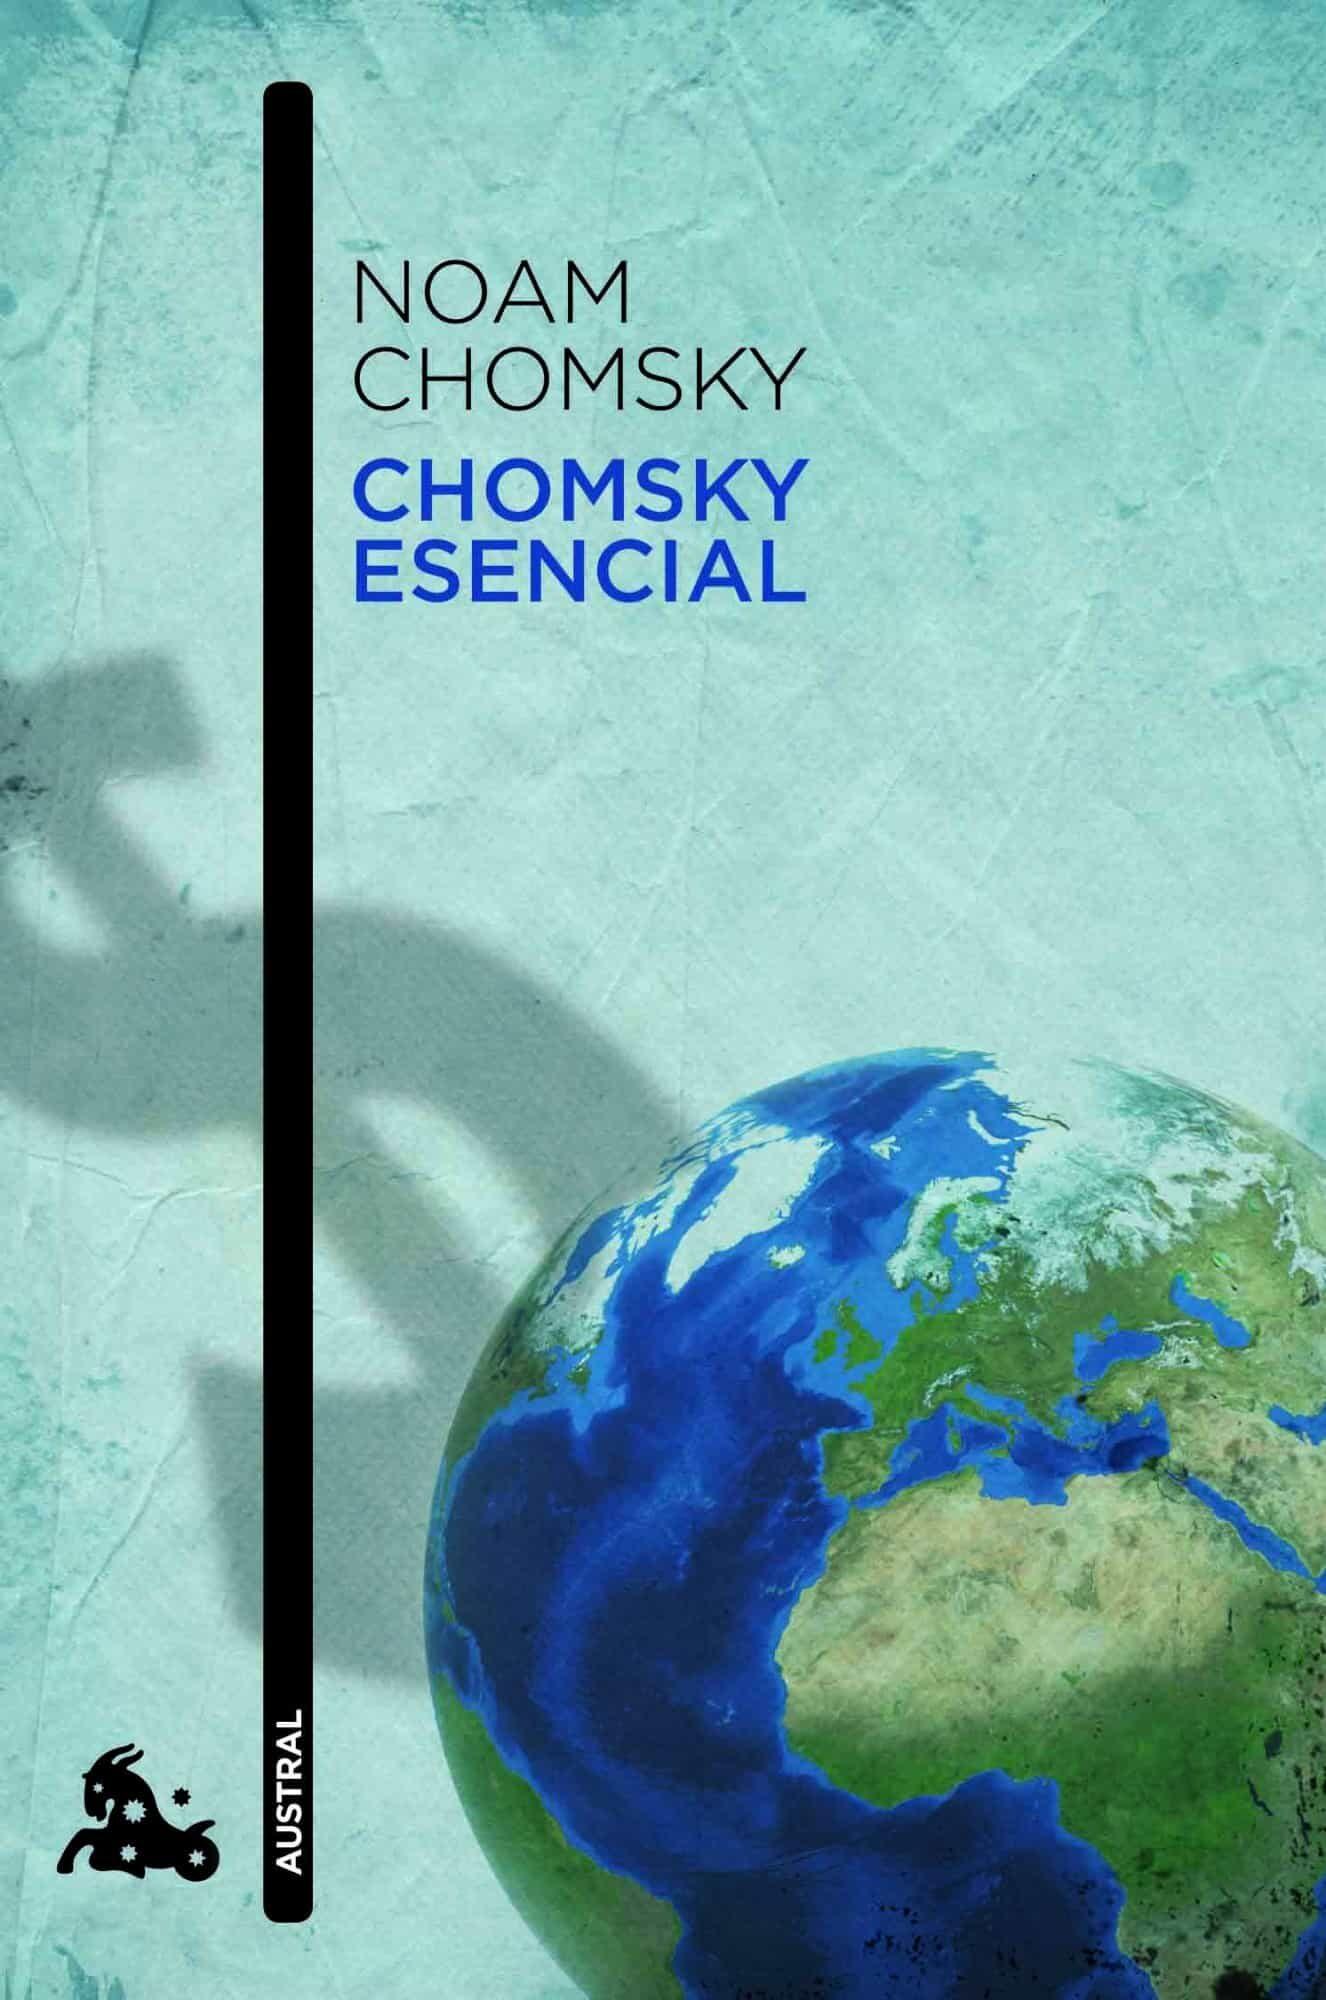 chomsky esencial-noam chomsky-9788408003939